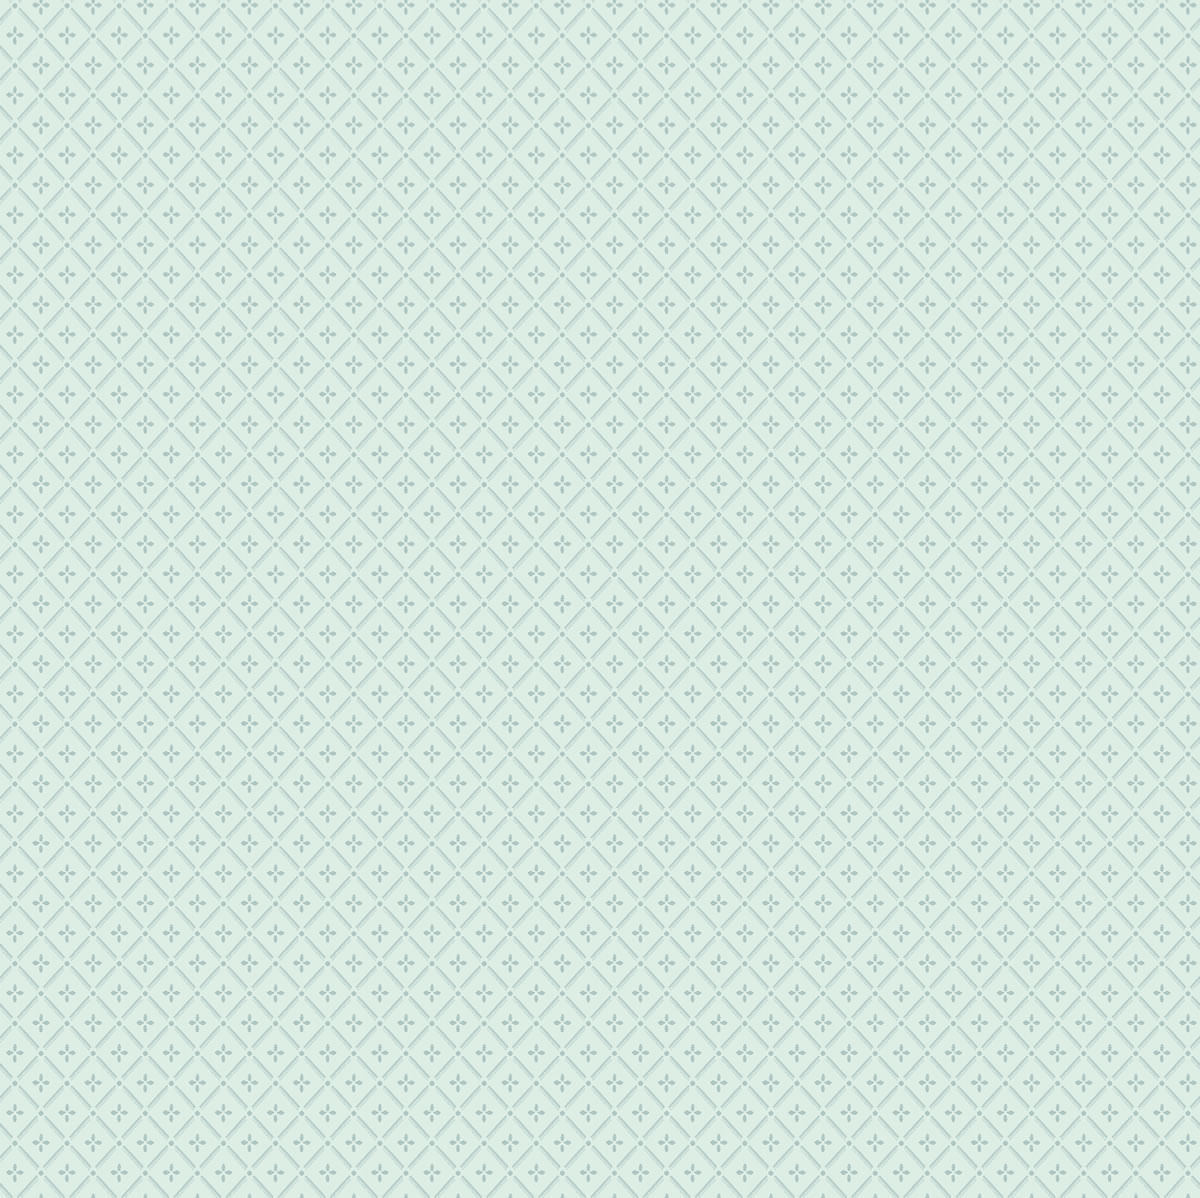 Papel de Parede Mido Mosaico 105045 - Rolo: 10m x 0,53m